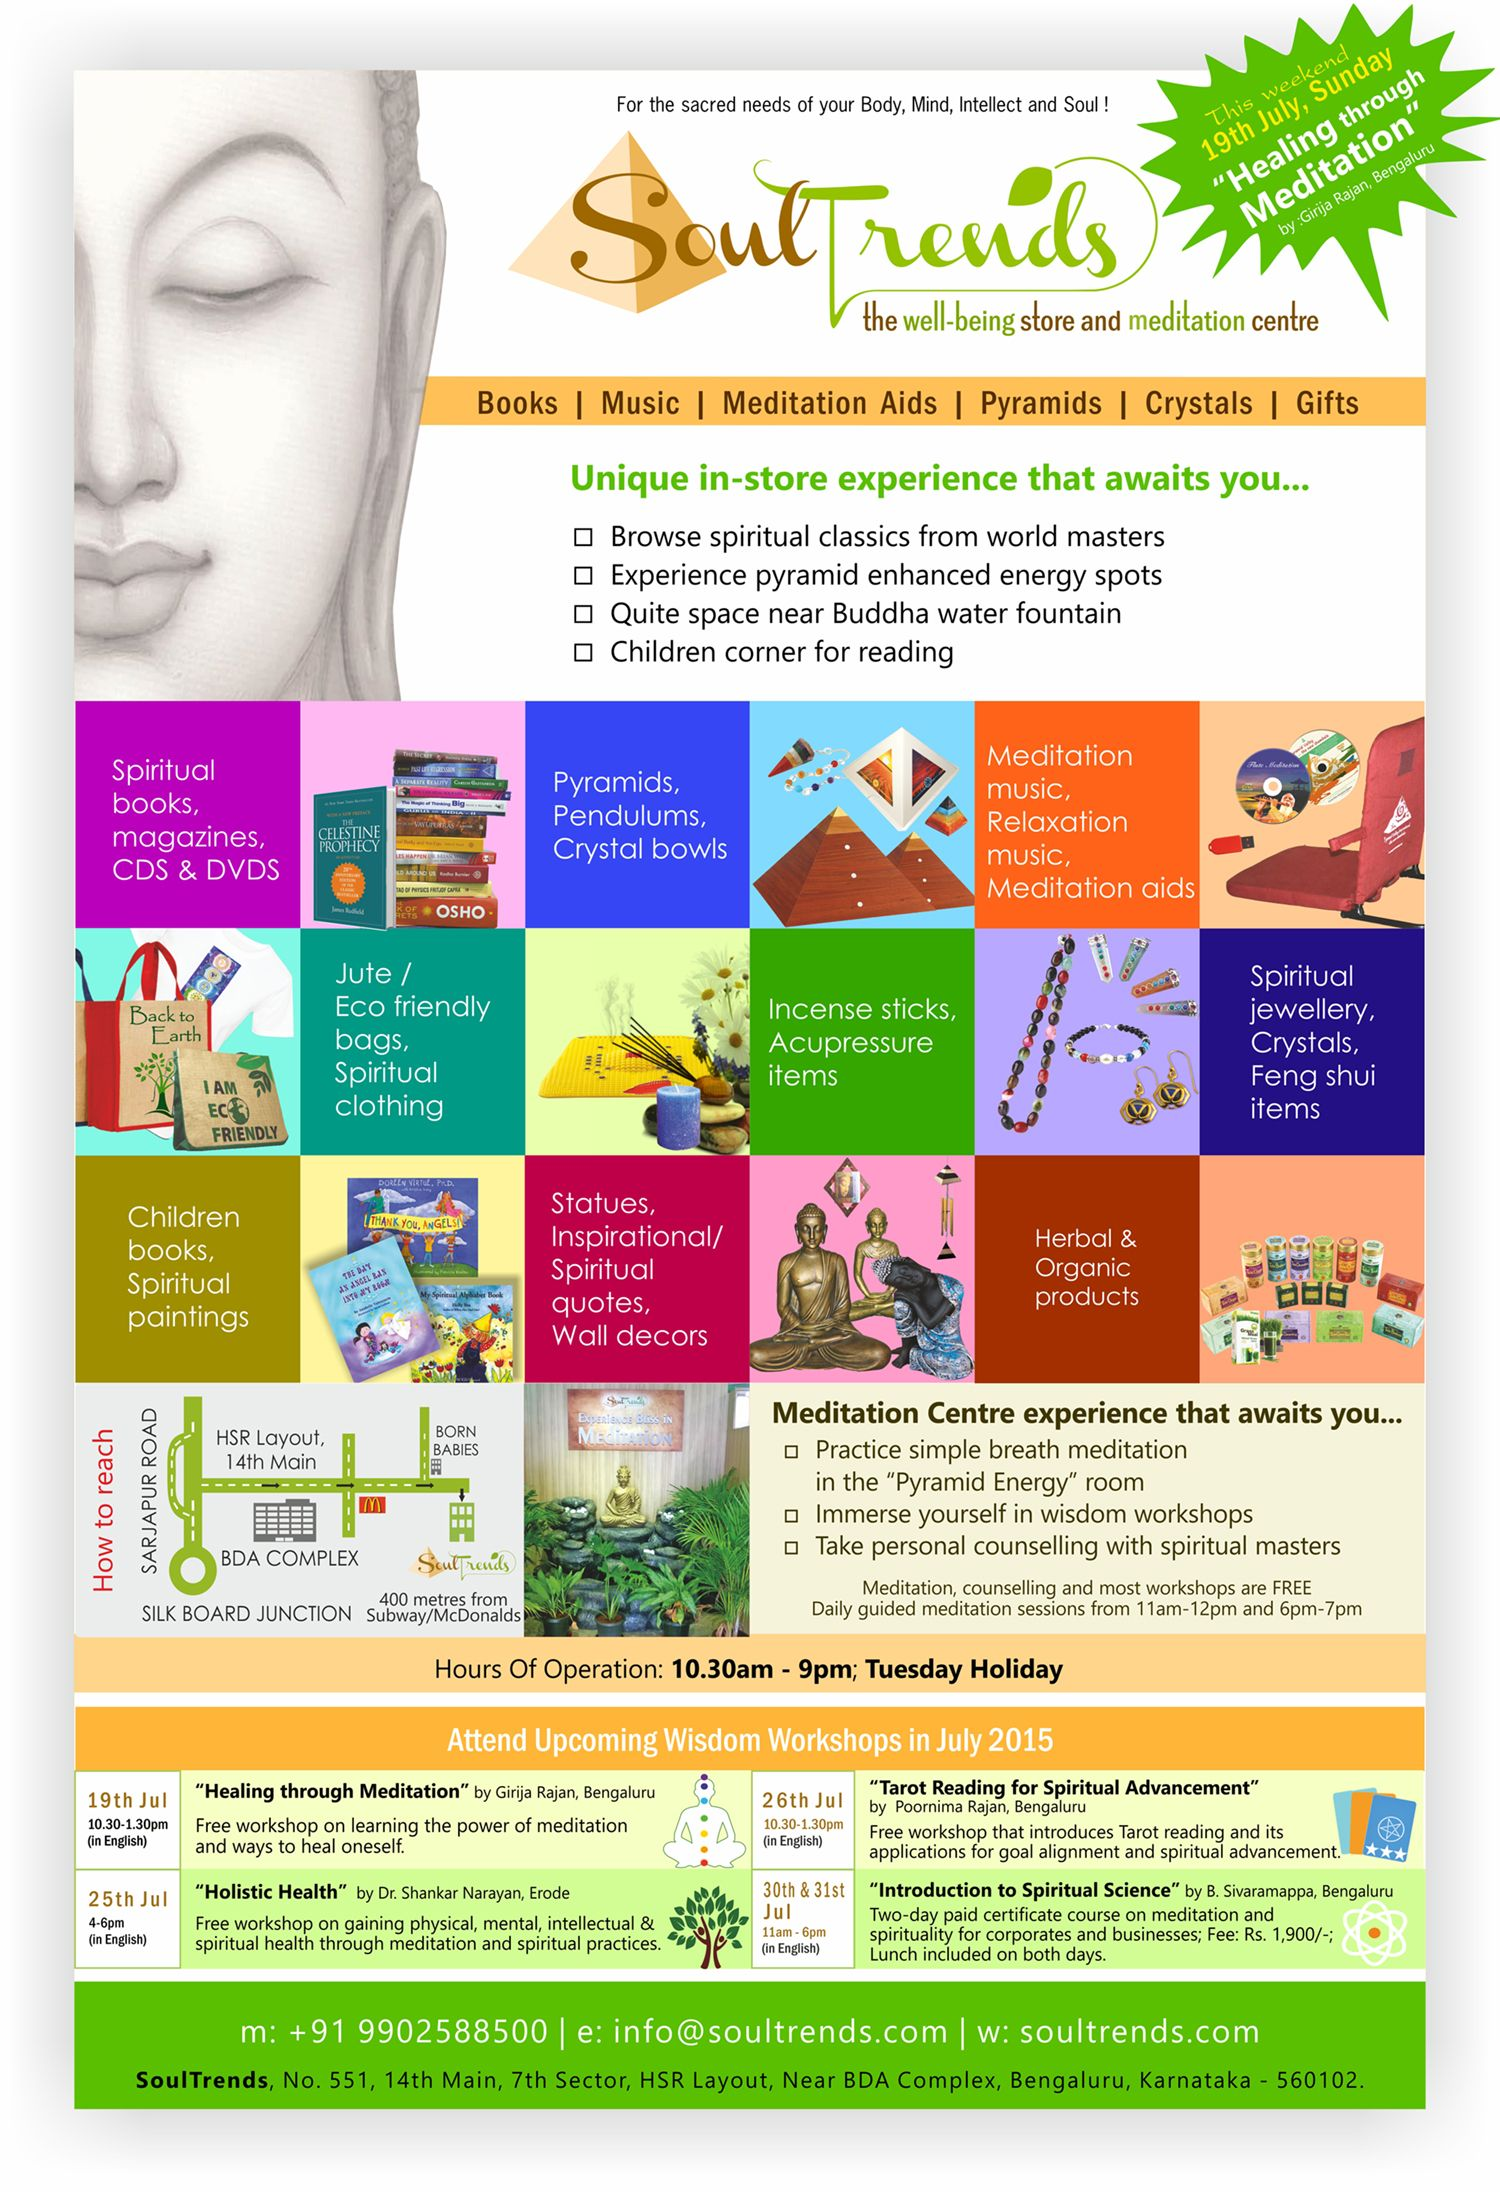 Free Workshop on '#Healing through #Meditation' by Girija Rajan on 19th Jul,10:30am-2:30pm. SoulTrends,551,14th main,Sector-7,HSR Near BDA Complx. 9902588500